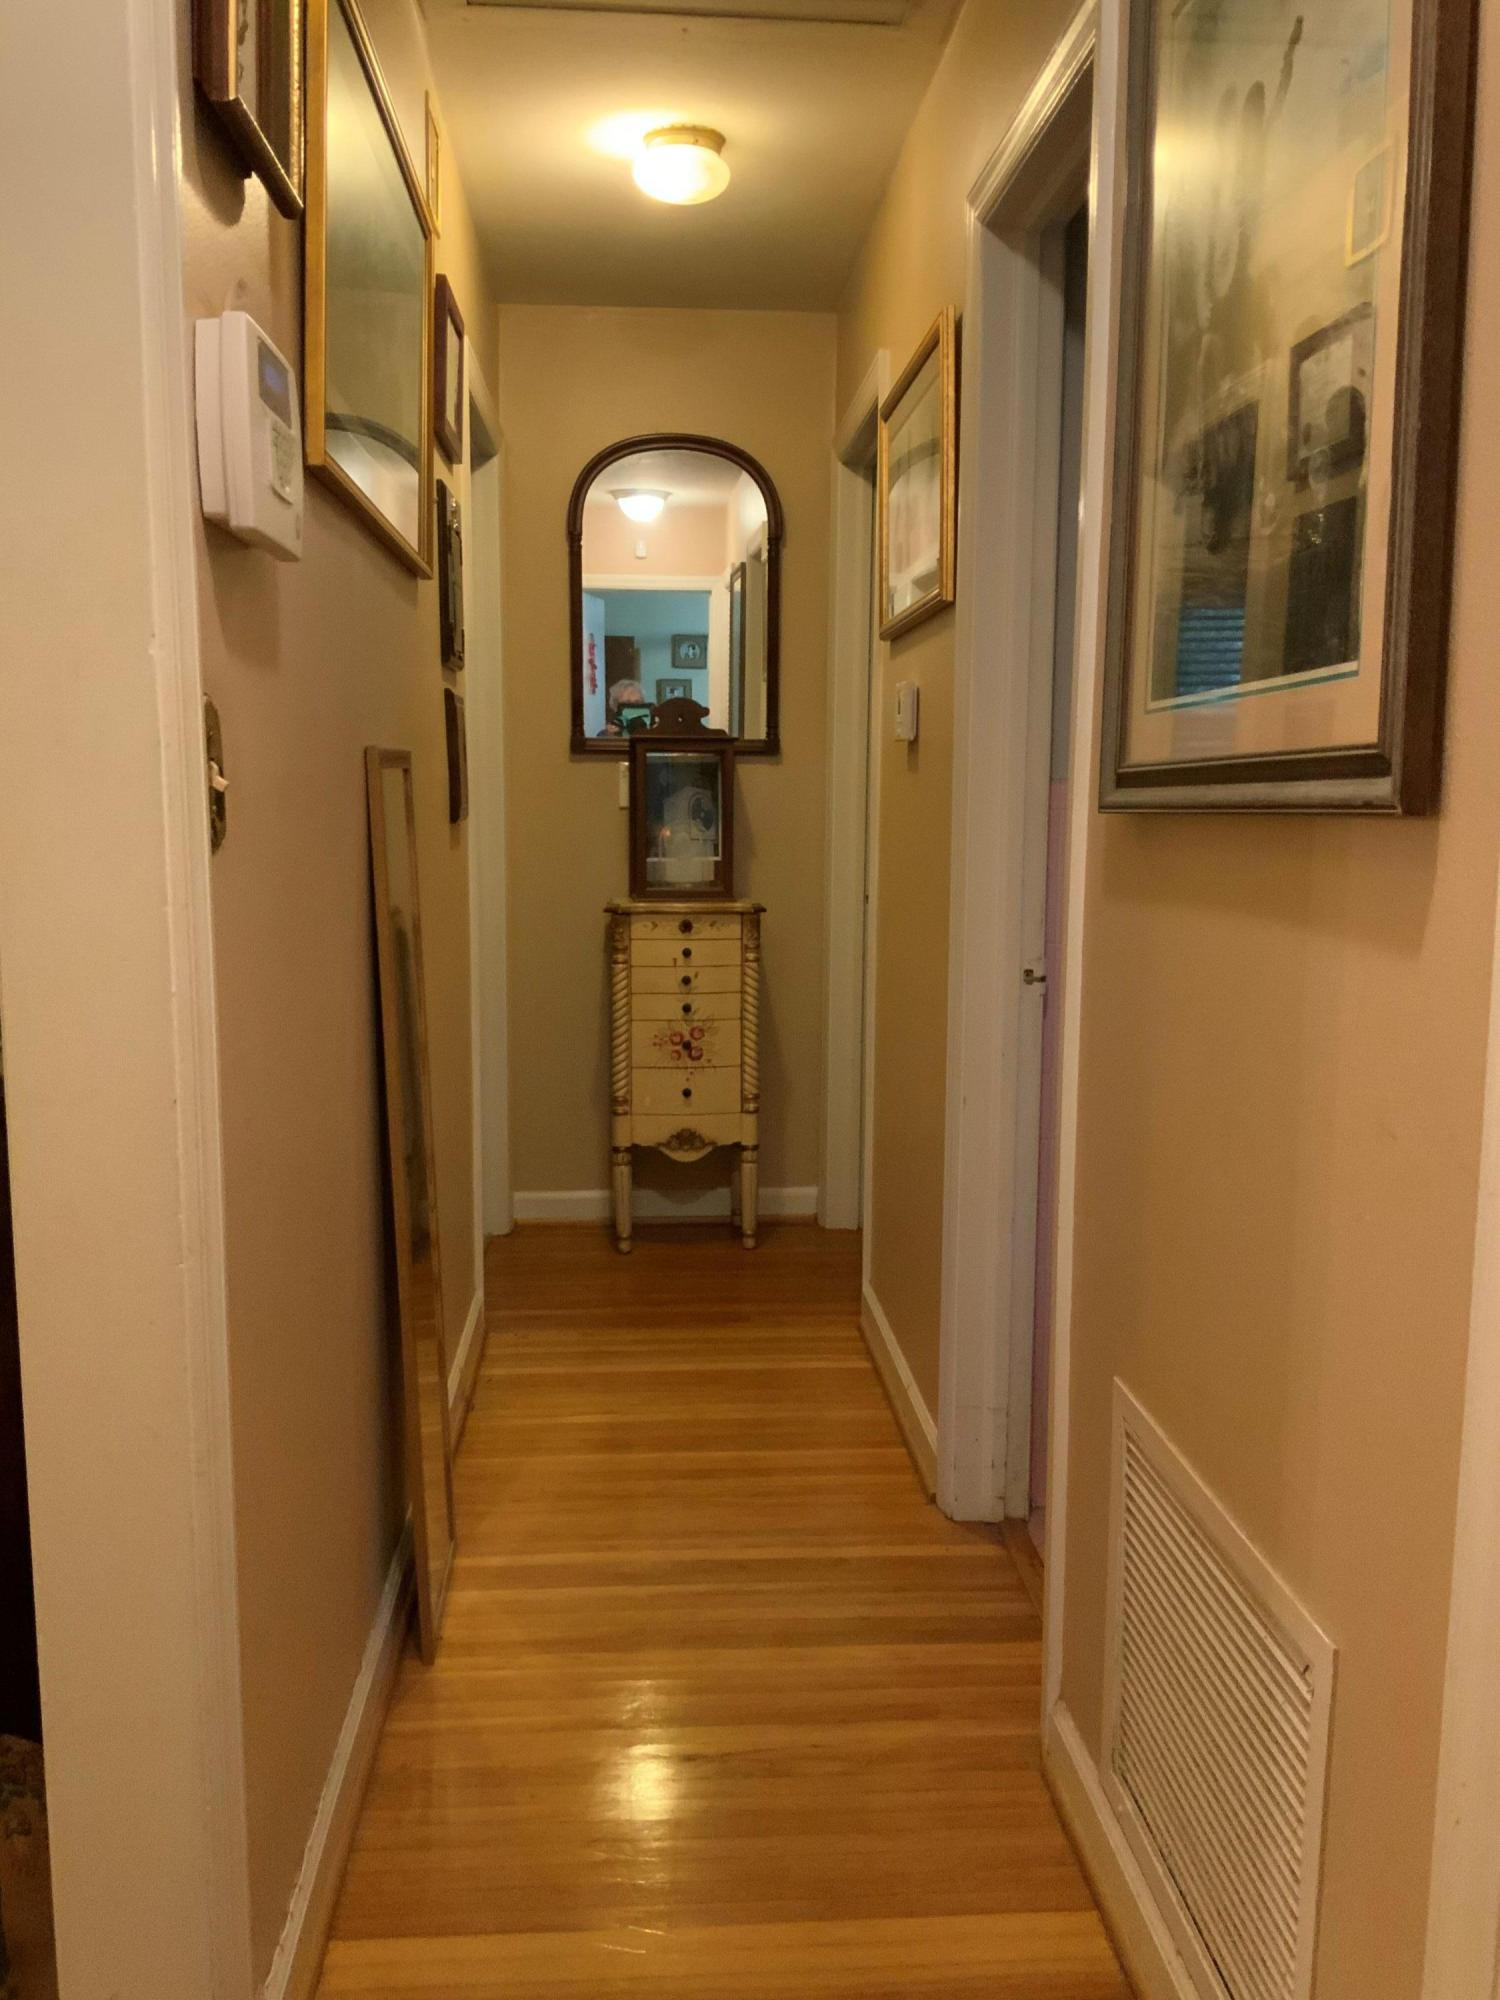 Northbridge Terrace Homes For Sale - 1156 Northbridge, Charleston, SC - 13